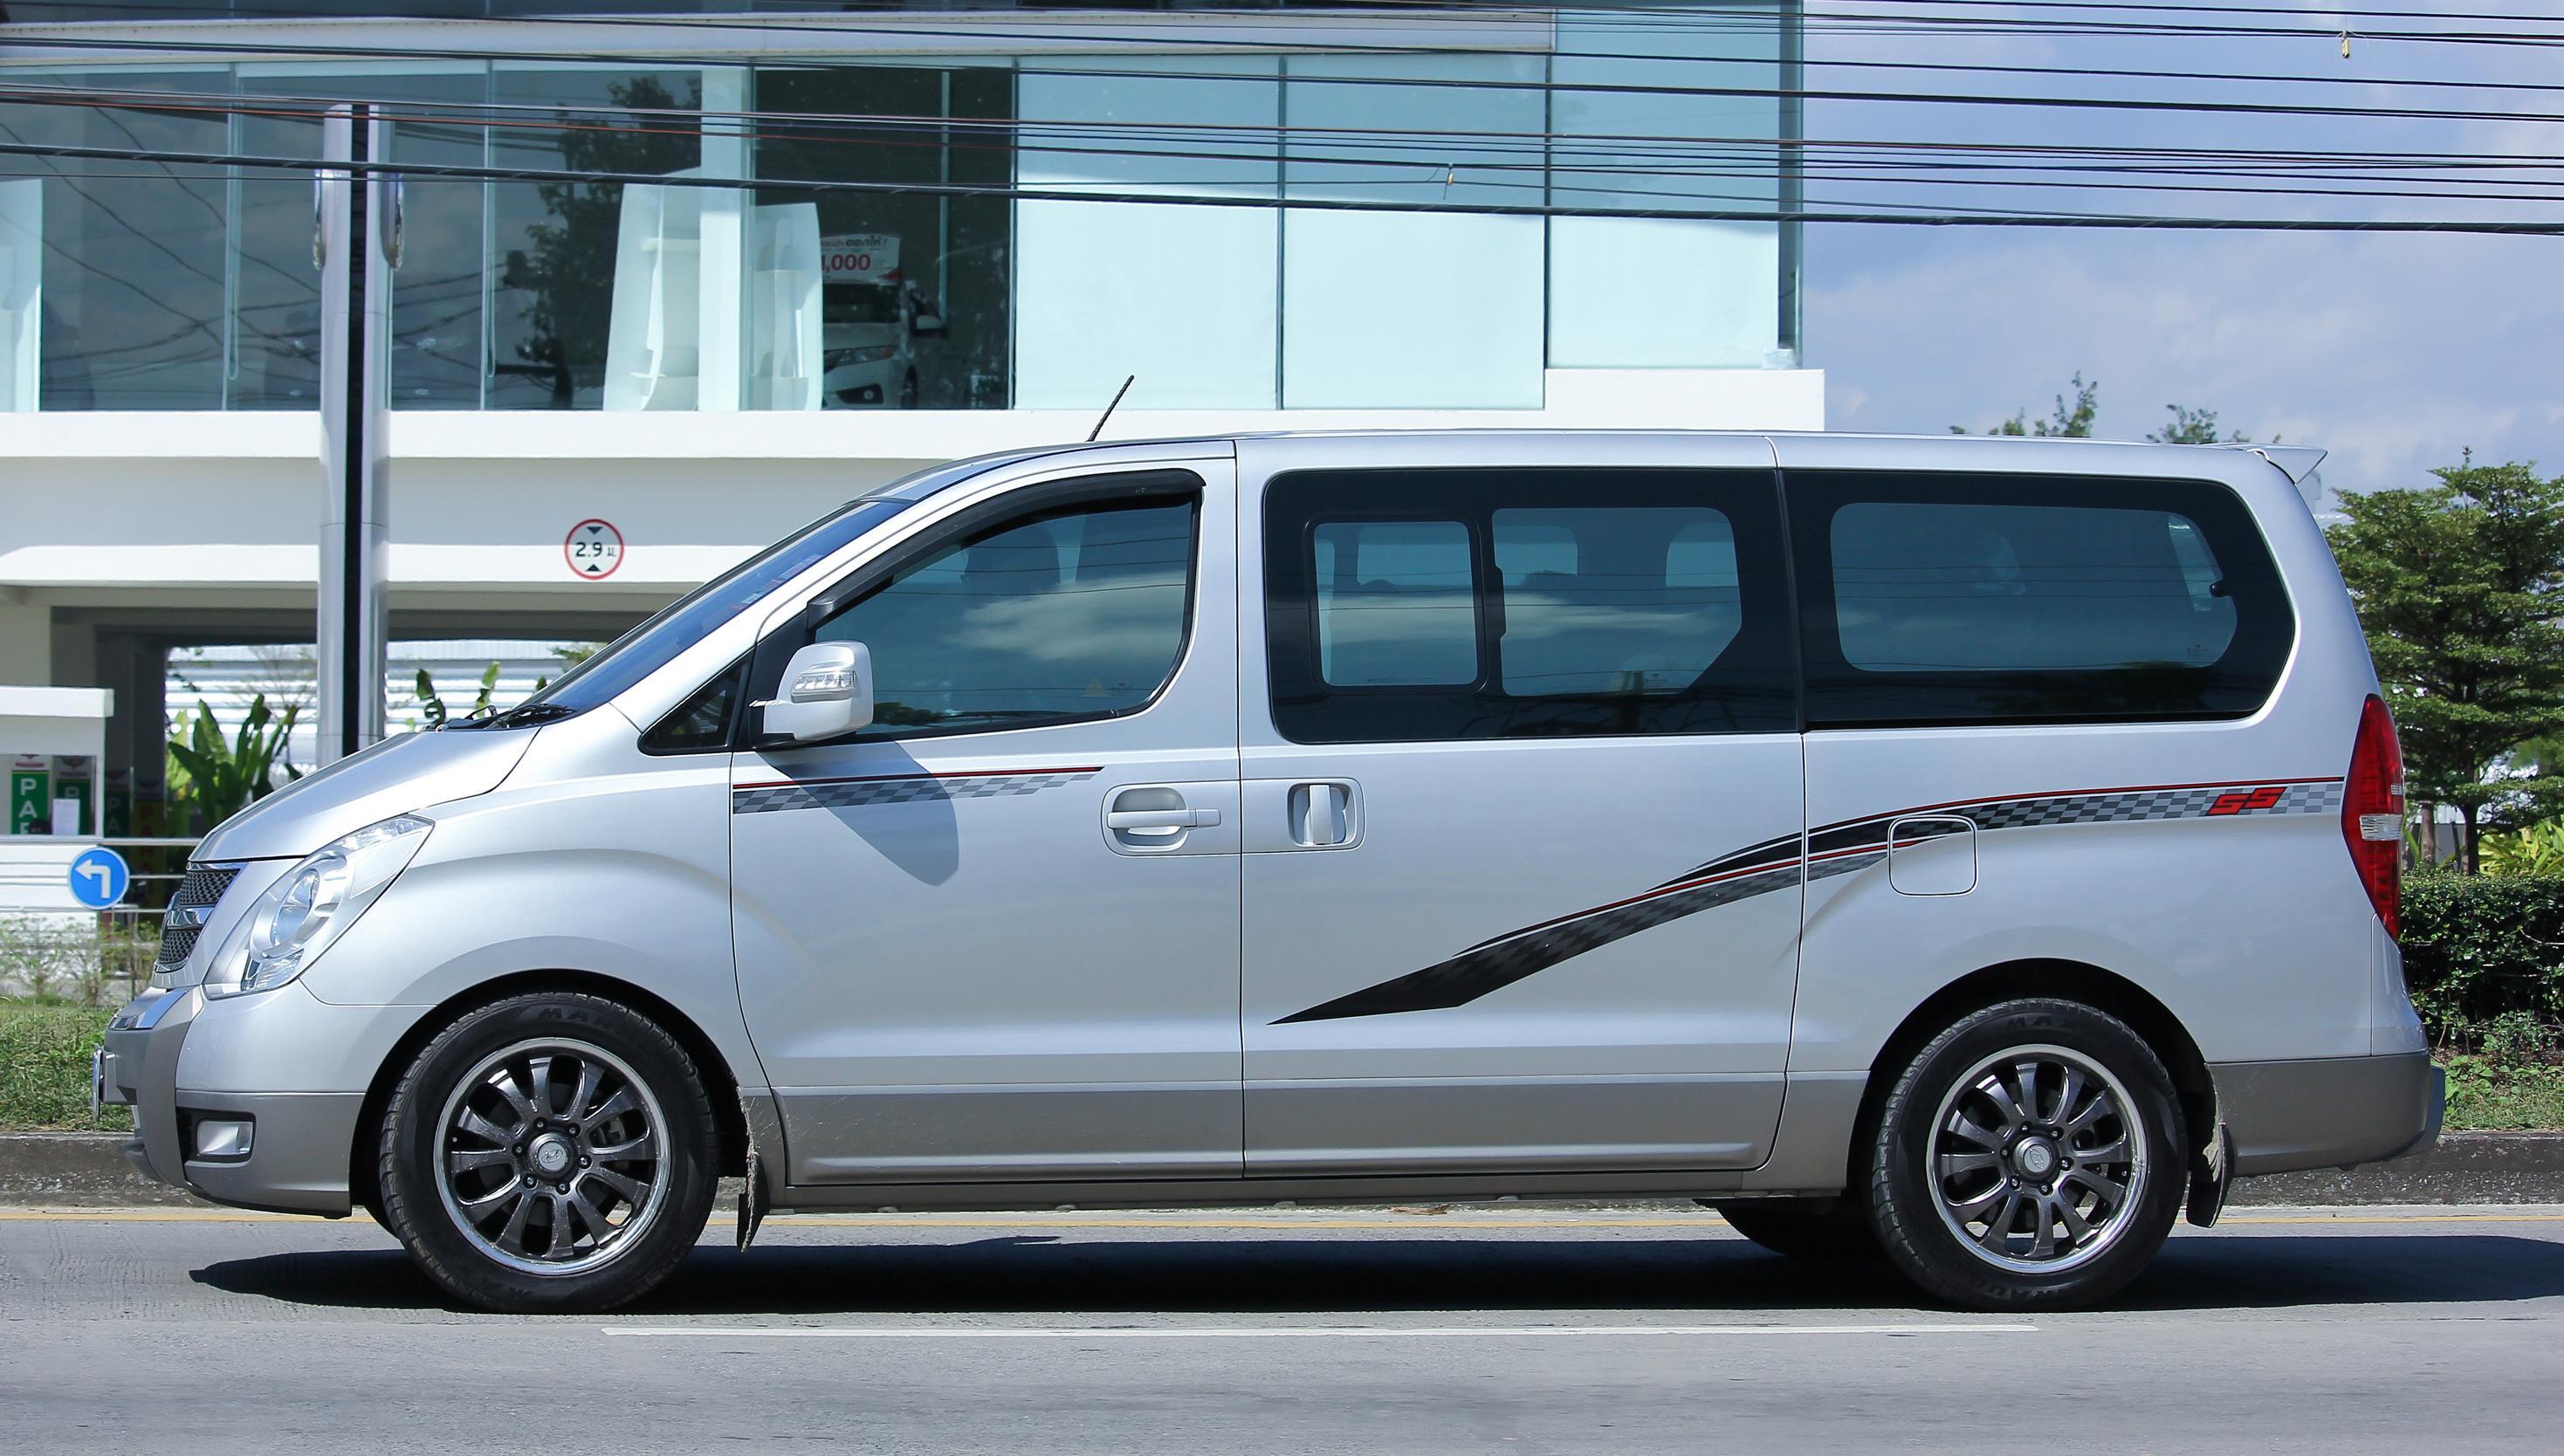 Std Fleet - Hyundai iMax